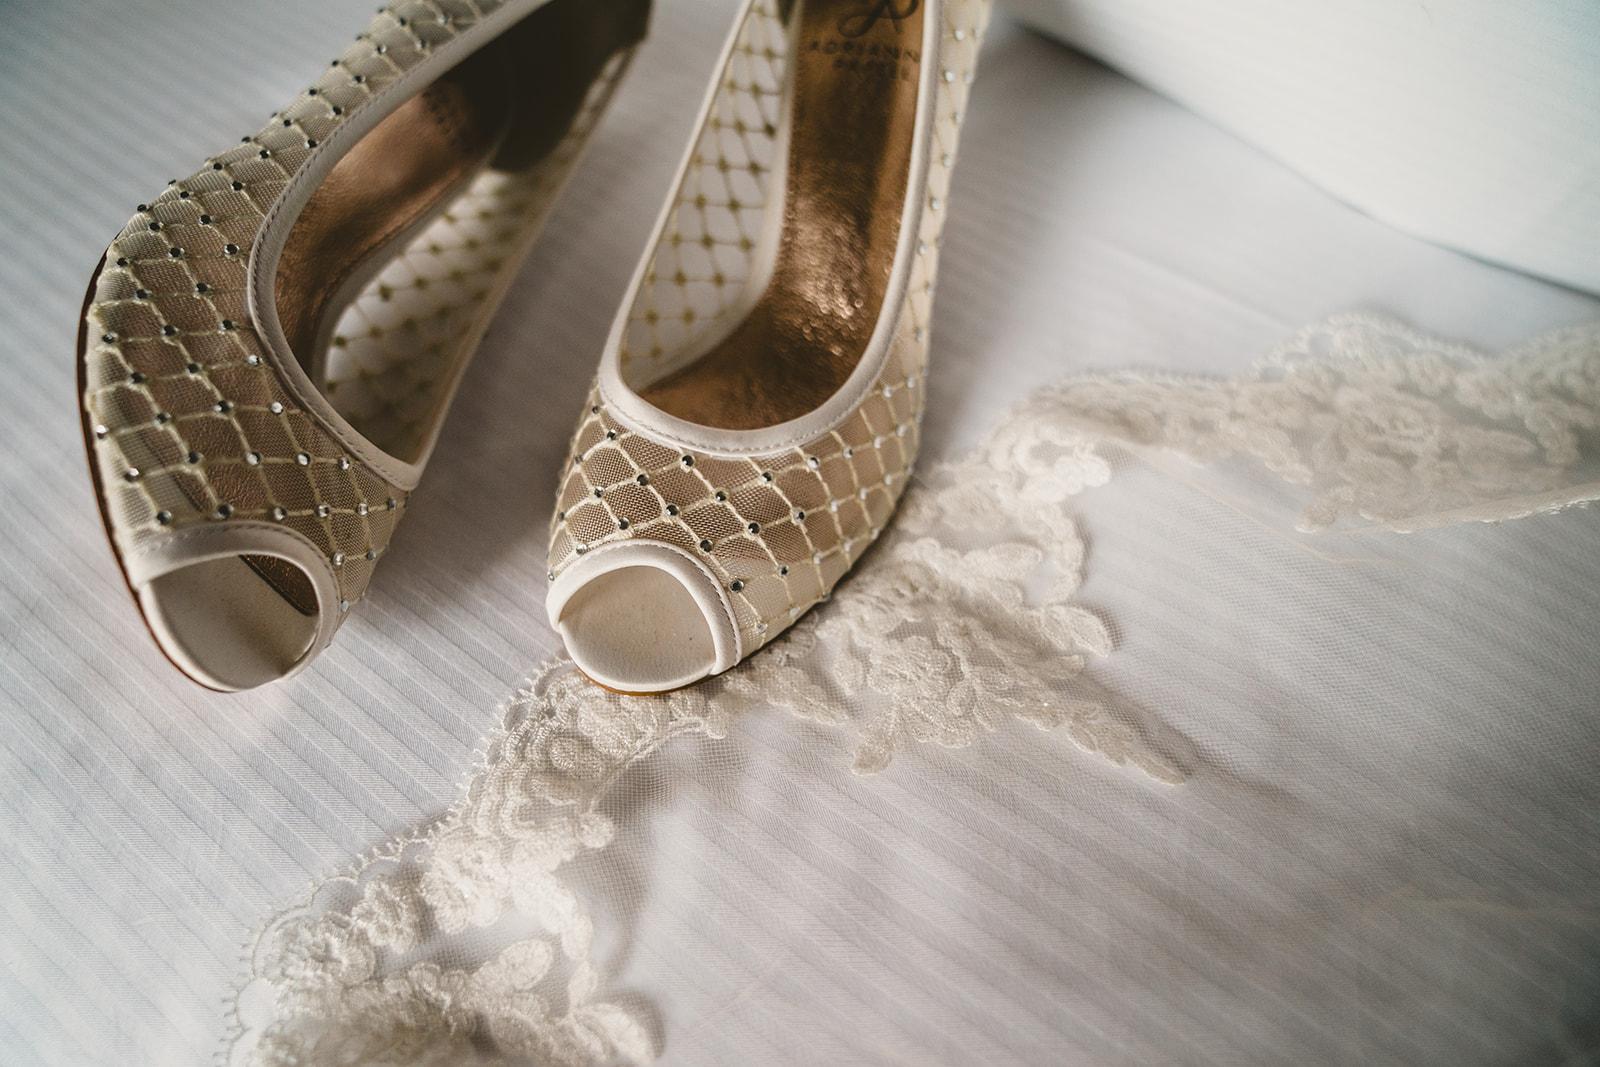 10-20-18-Katy-Kevin-Wedding-Embassy_Suites-Alexandria-VA-1038_websize.jpg